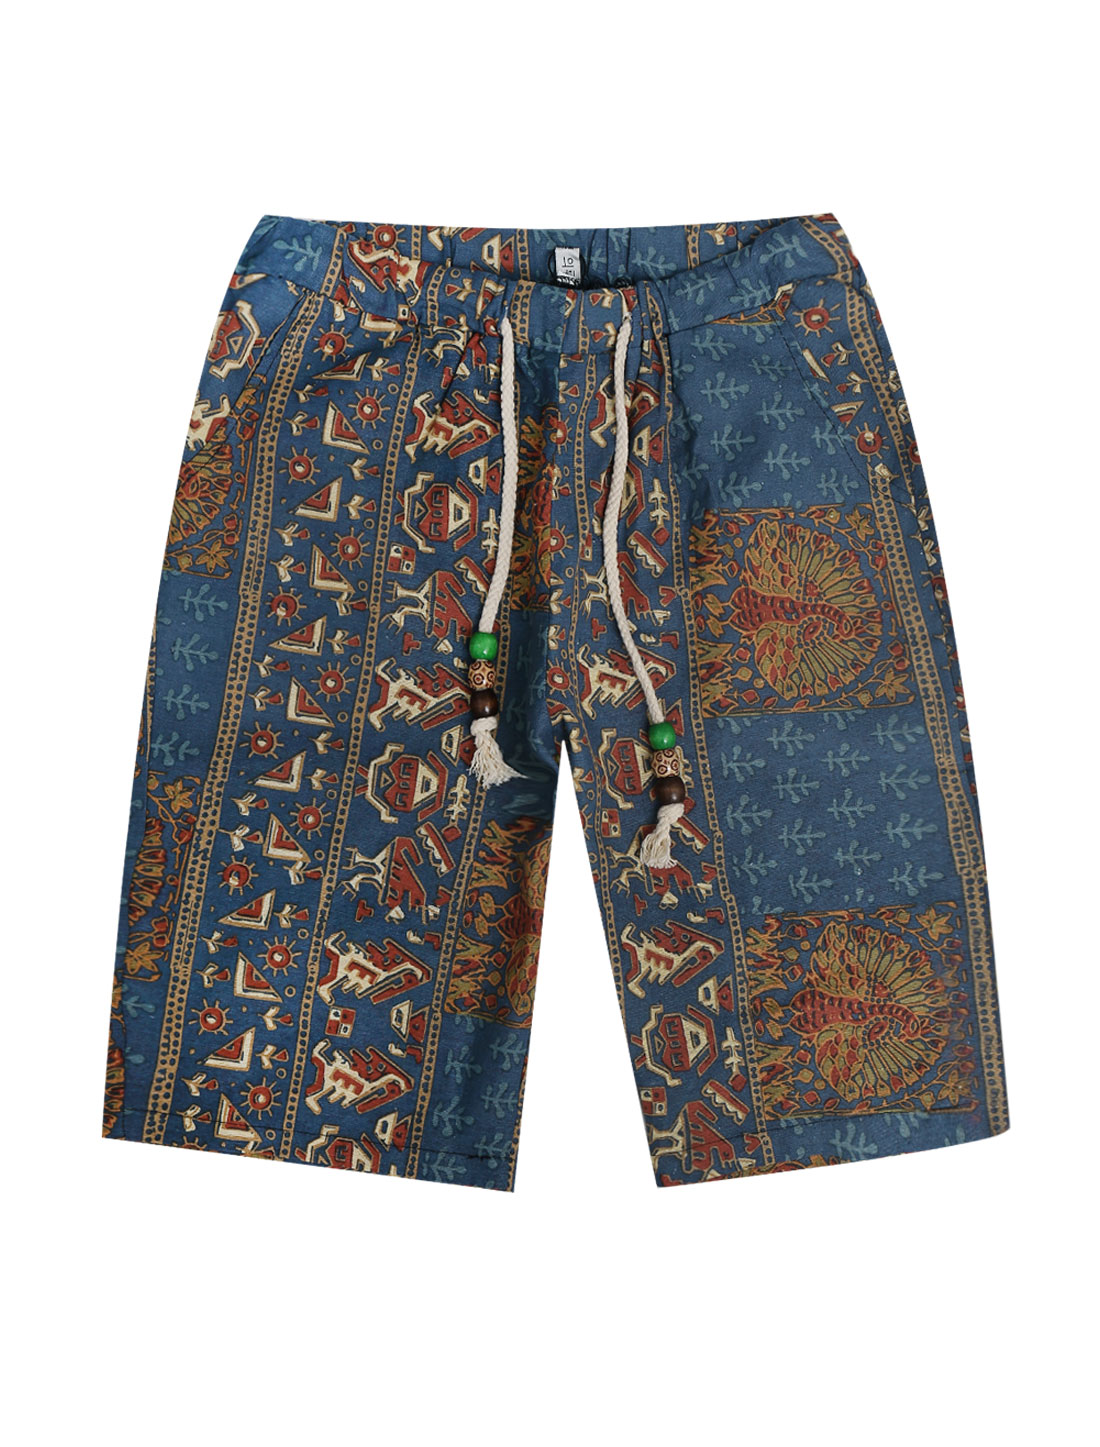 Men Elastic Drawstring Waist Novelty Prints Shorts Beige Navy Blue W30